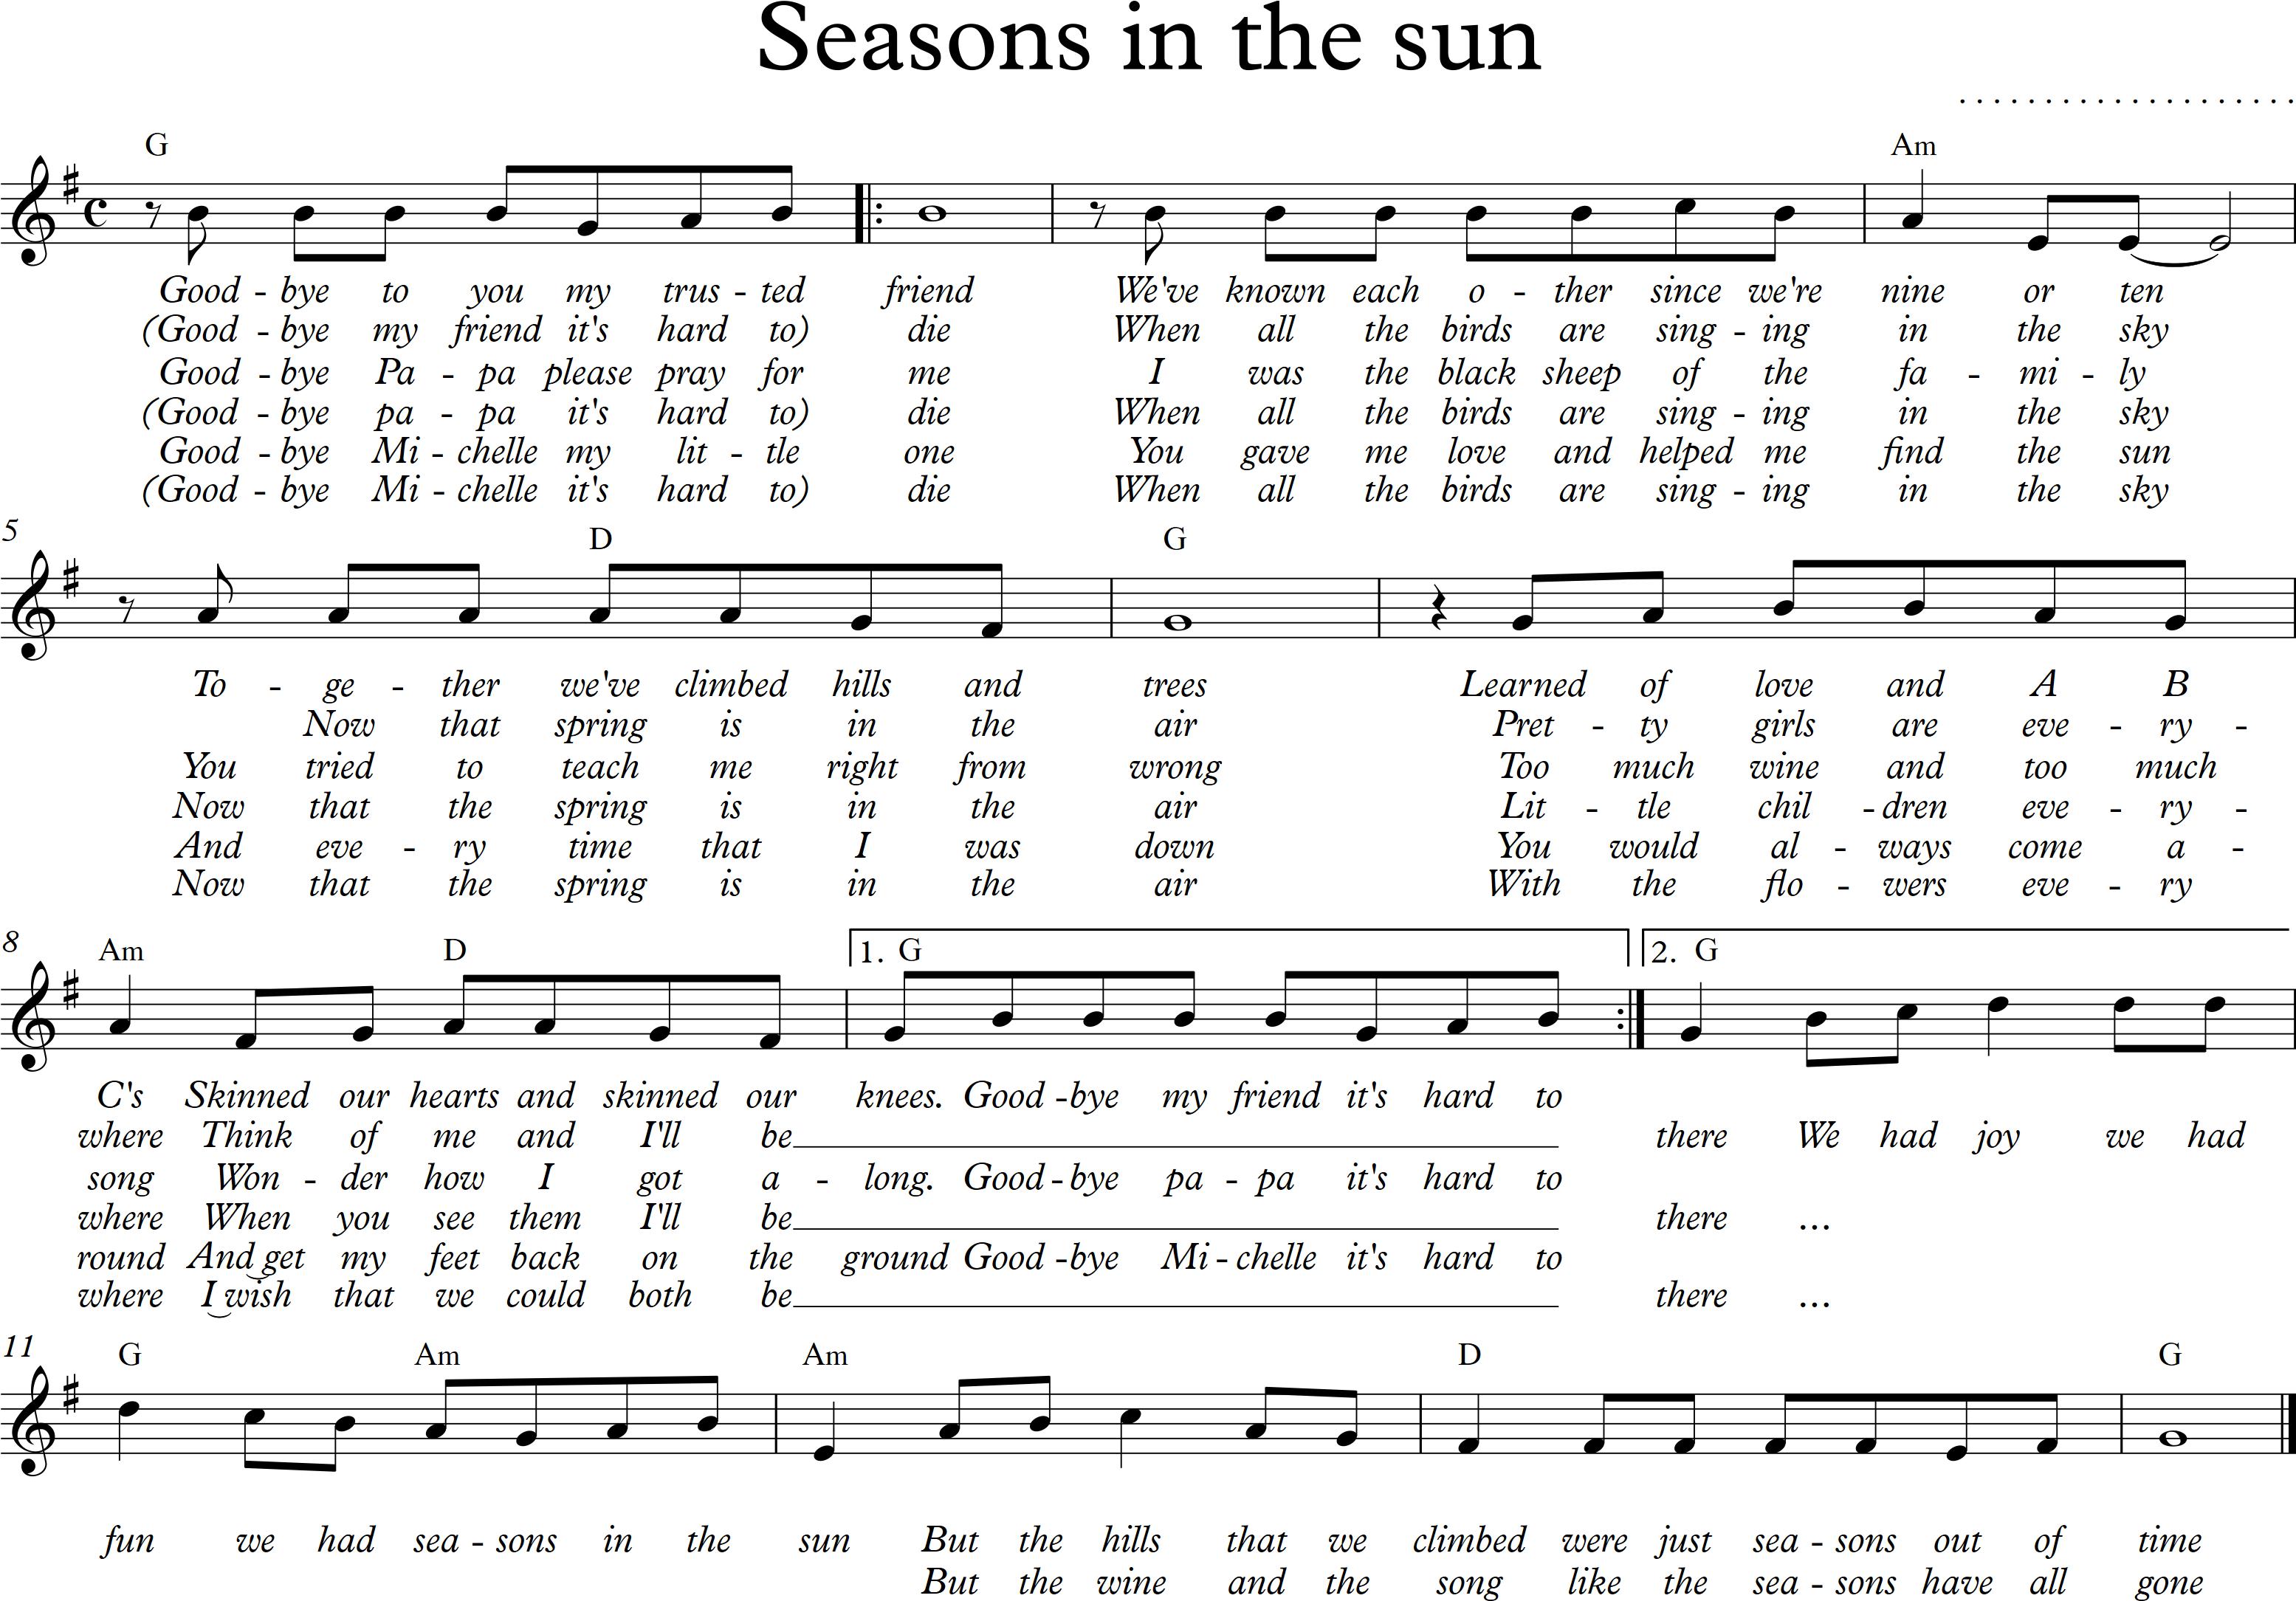 Seasons in the sun - G